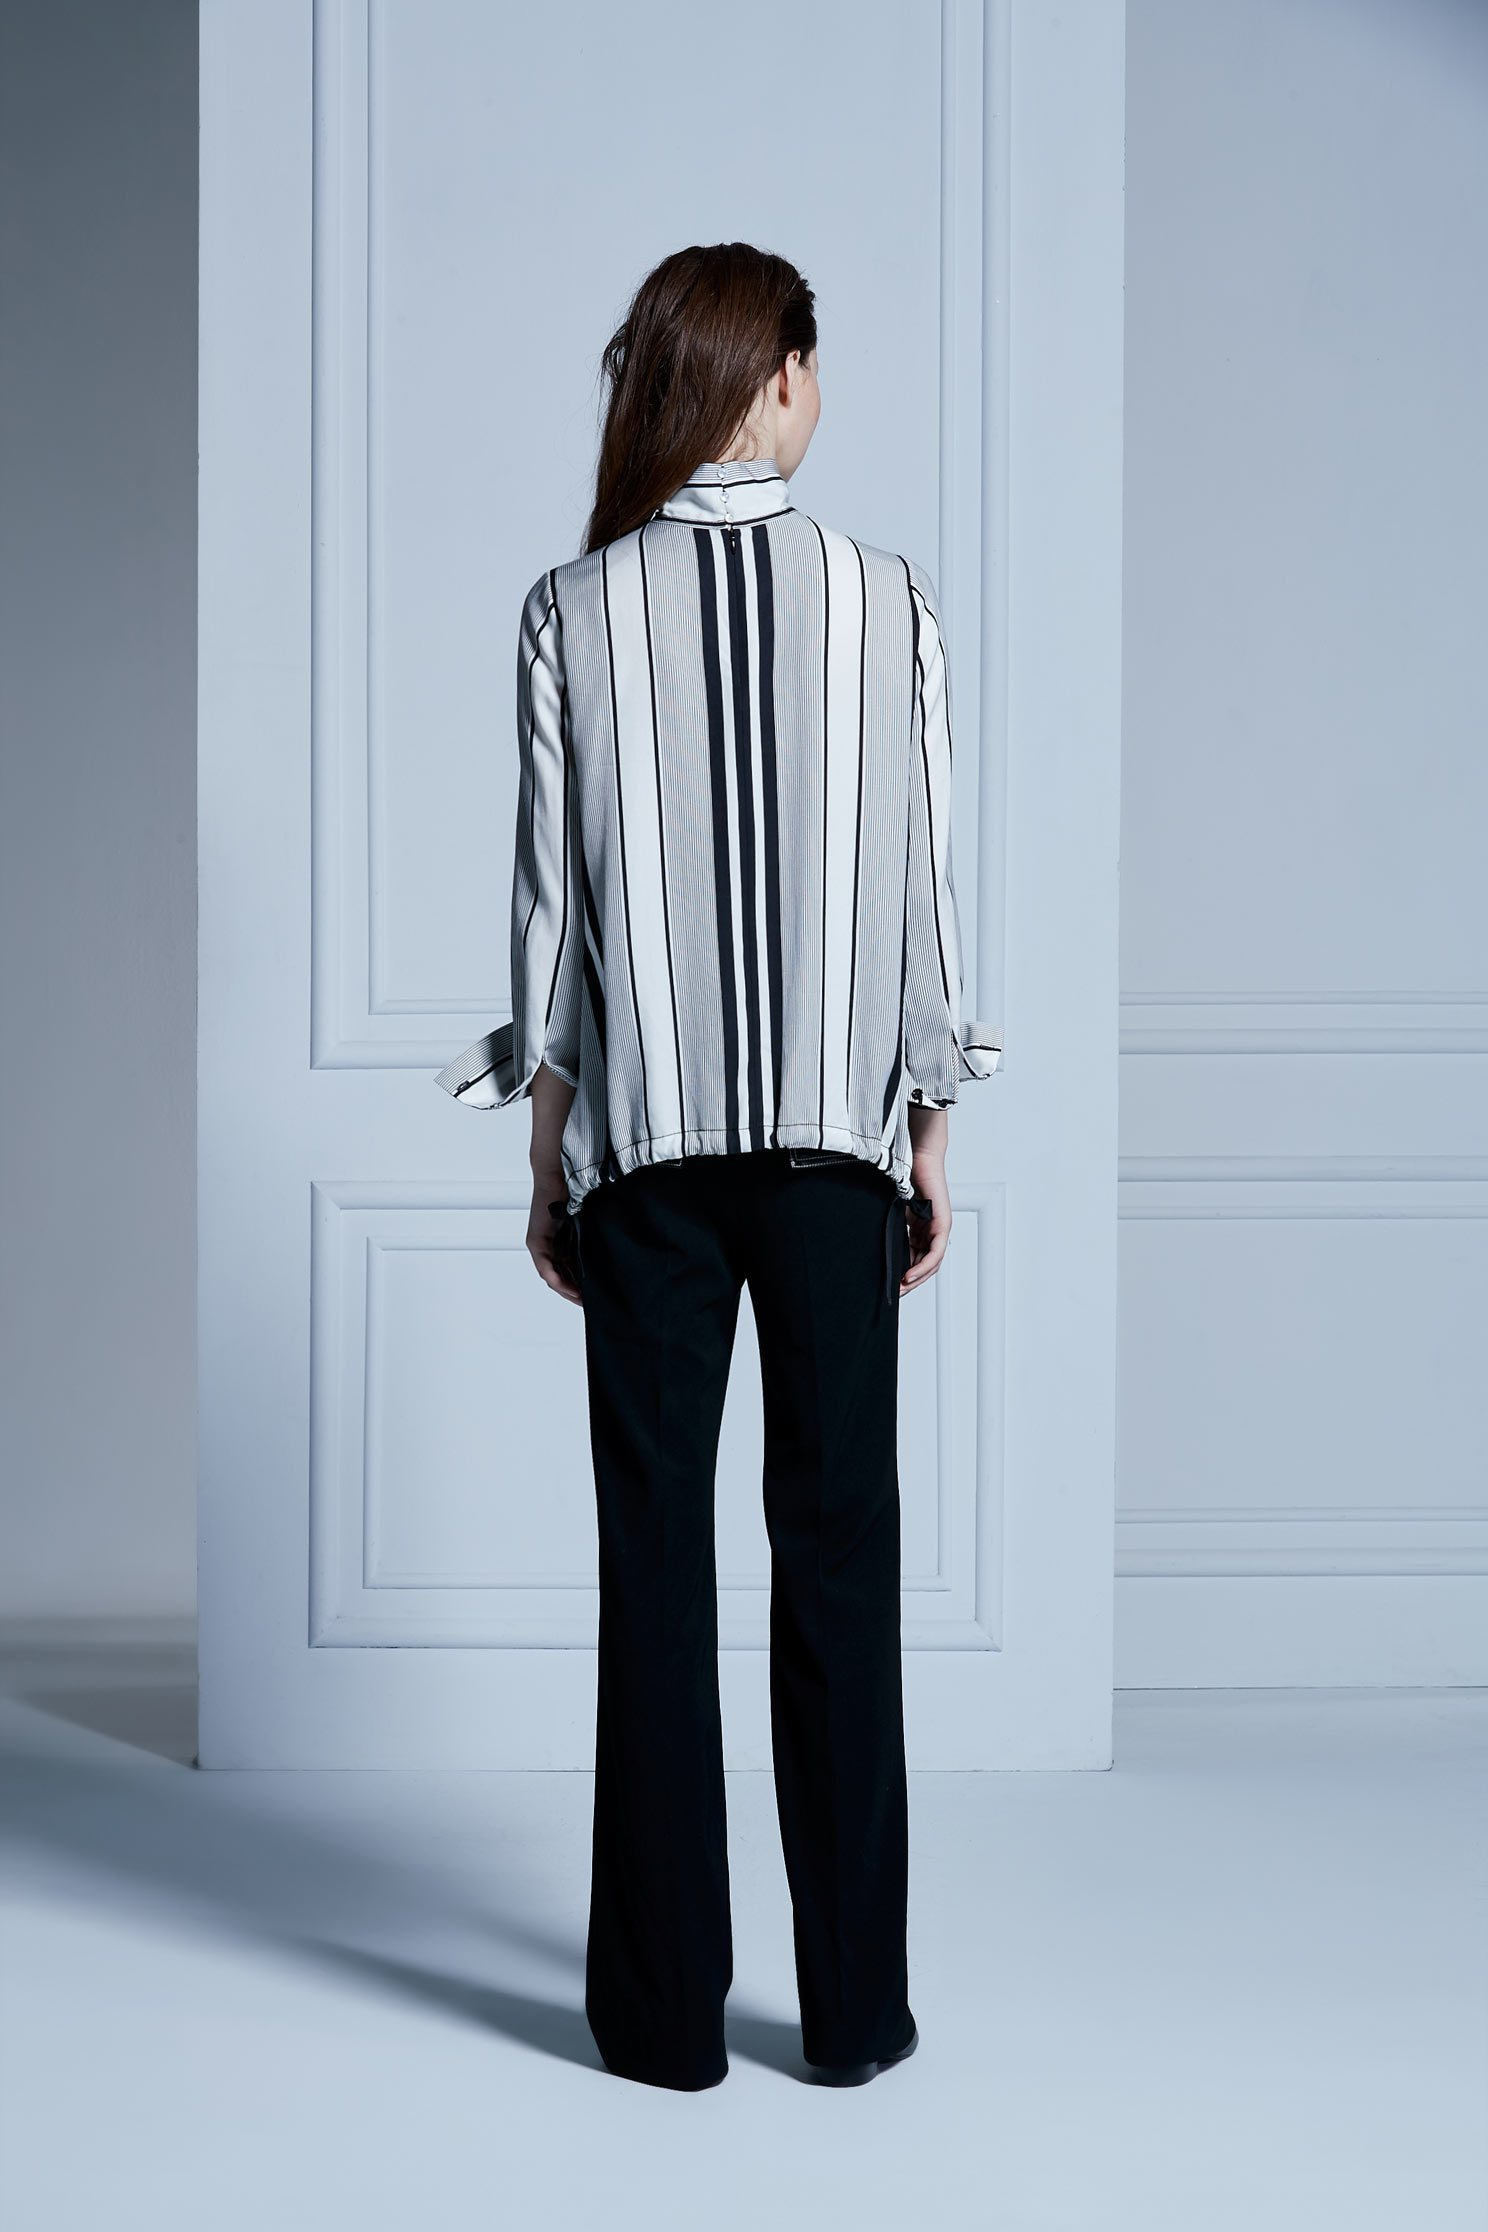 INVERTED LAPEL COLLAR top,Top,Rayon,Long top,長袖上衣